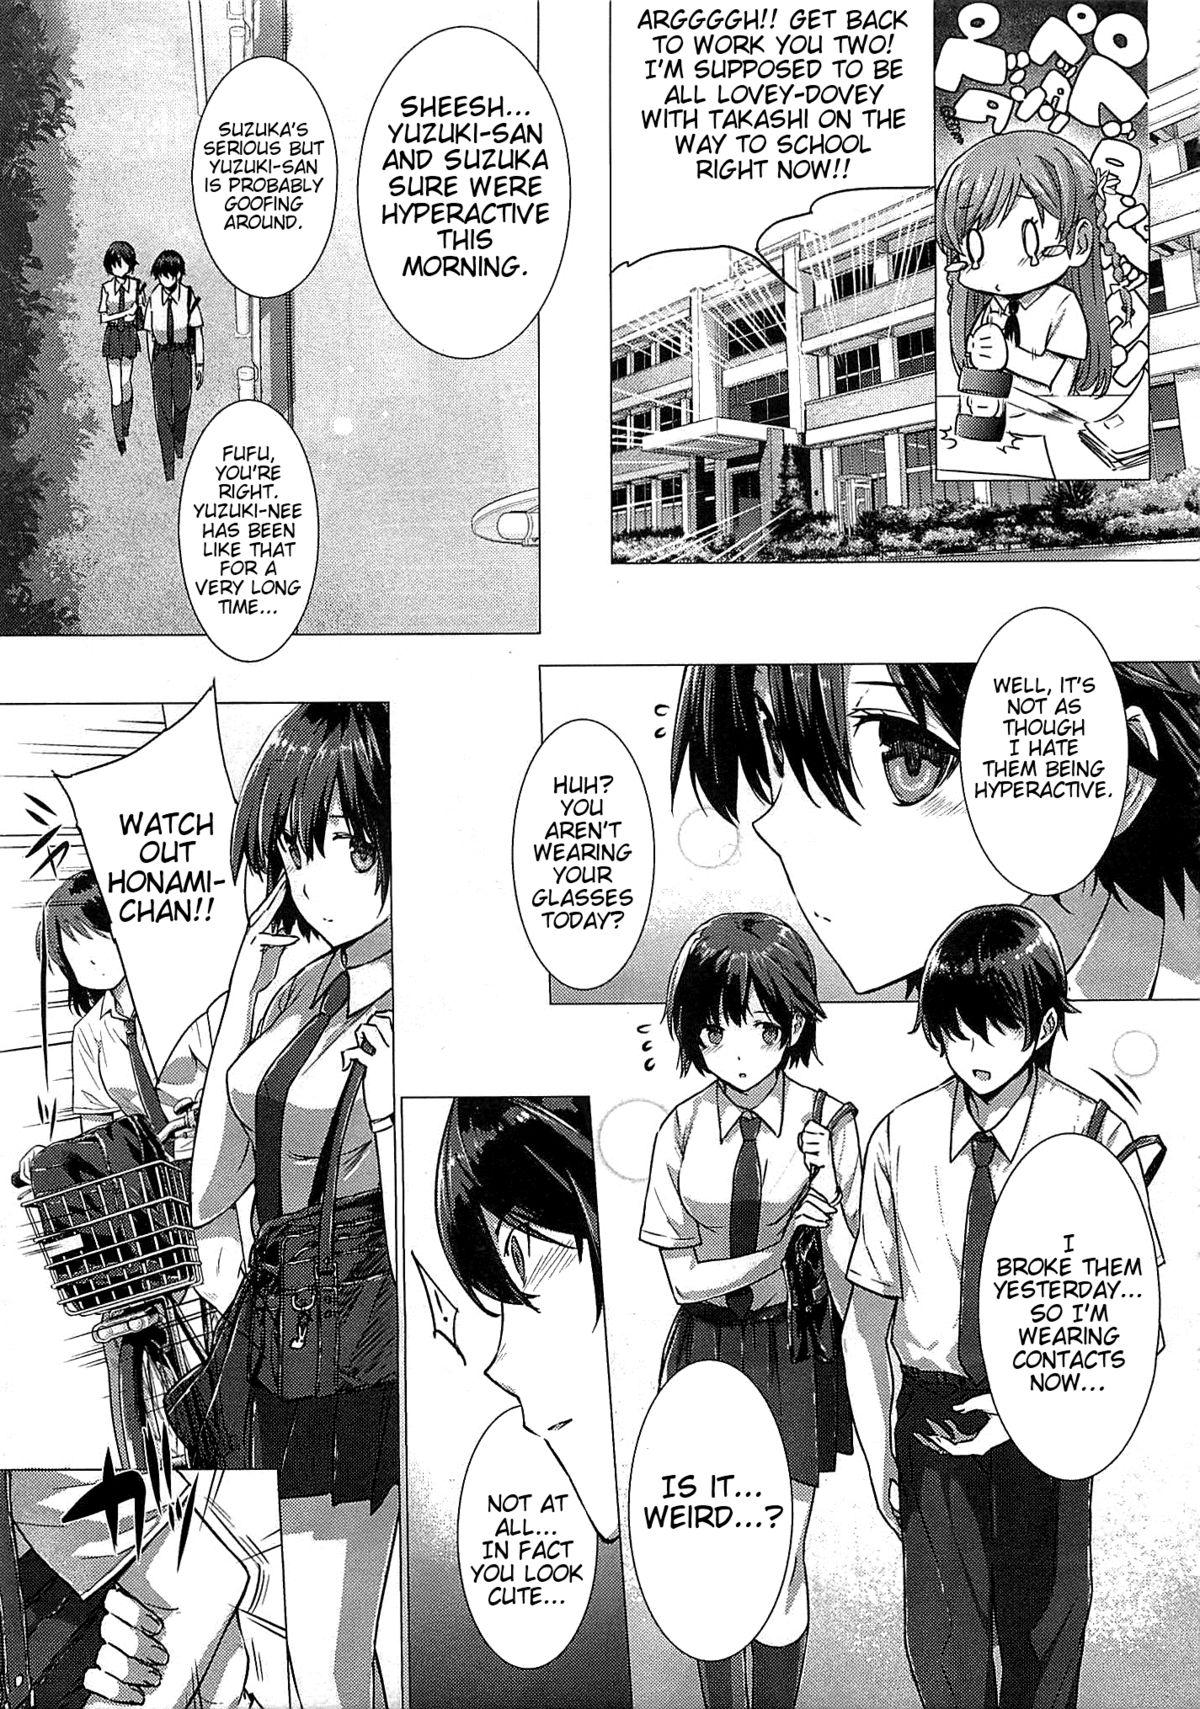 [Katsurai Yoshiaki] Kanojo wa Kazoku de Koibito de Ch. 1-3   She's My Family And My Lover Ch. 1-3 [English] {doujin-moe.us} 32